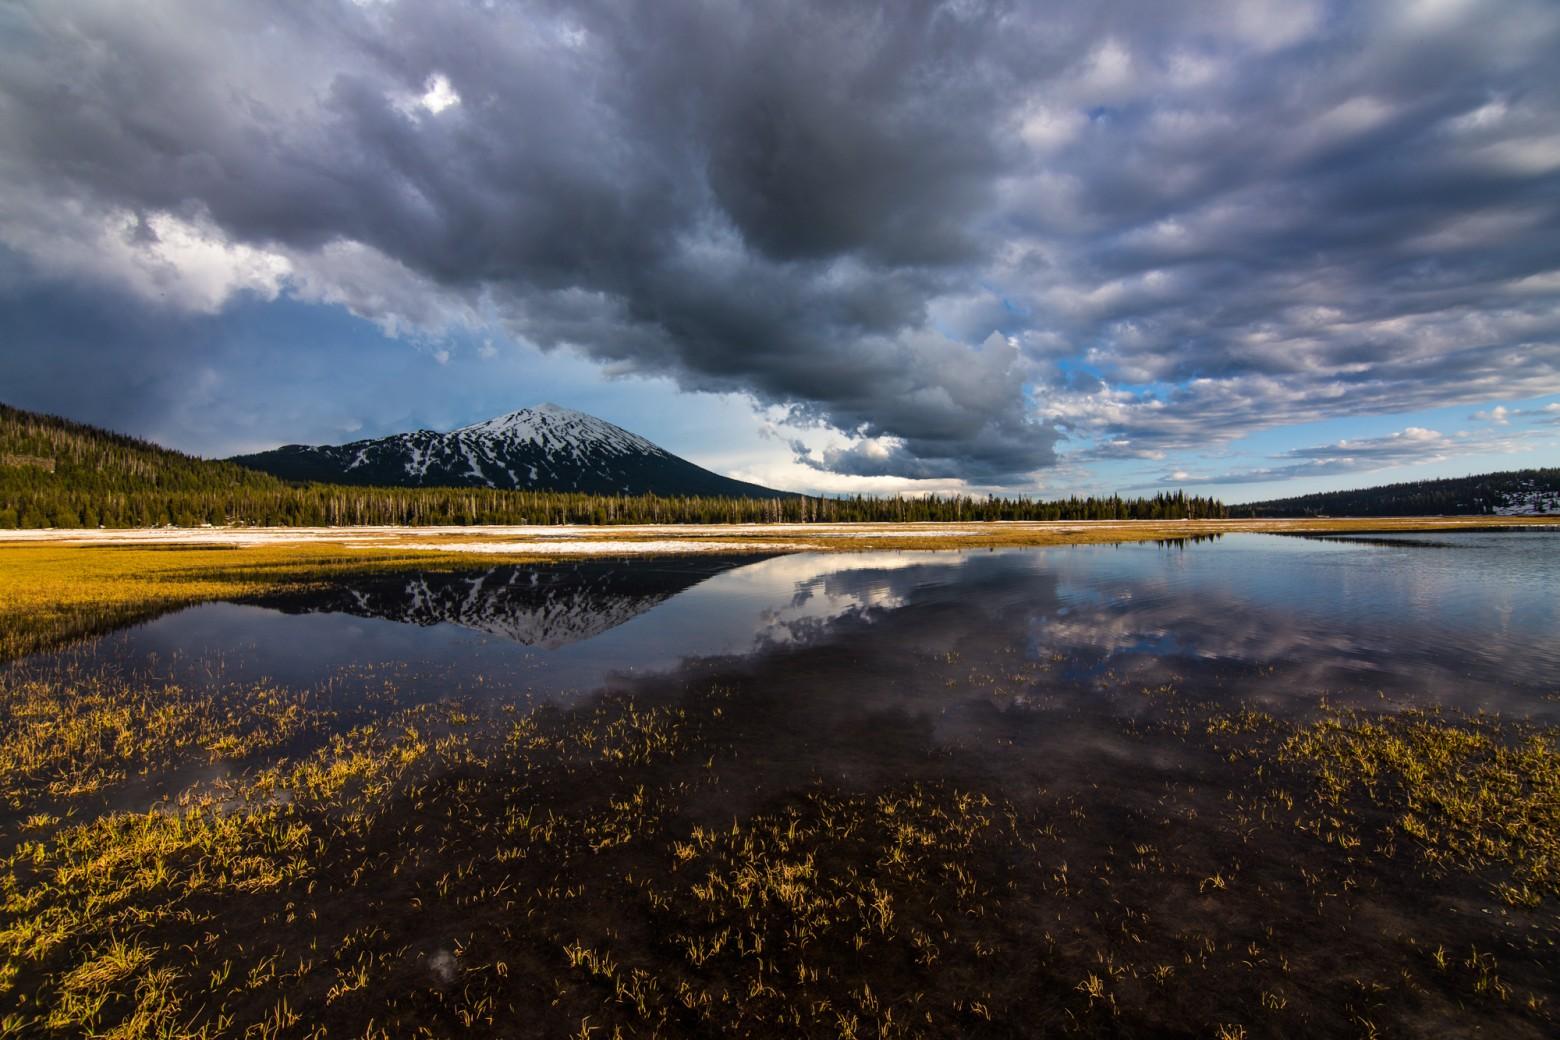 Mt Bachelor Sparks Lake